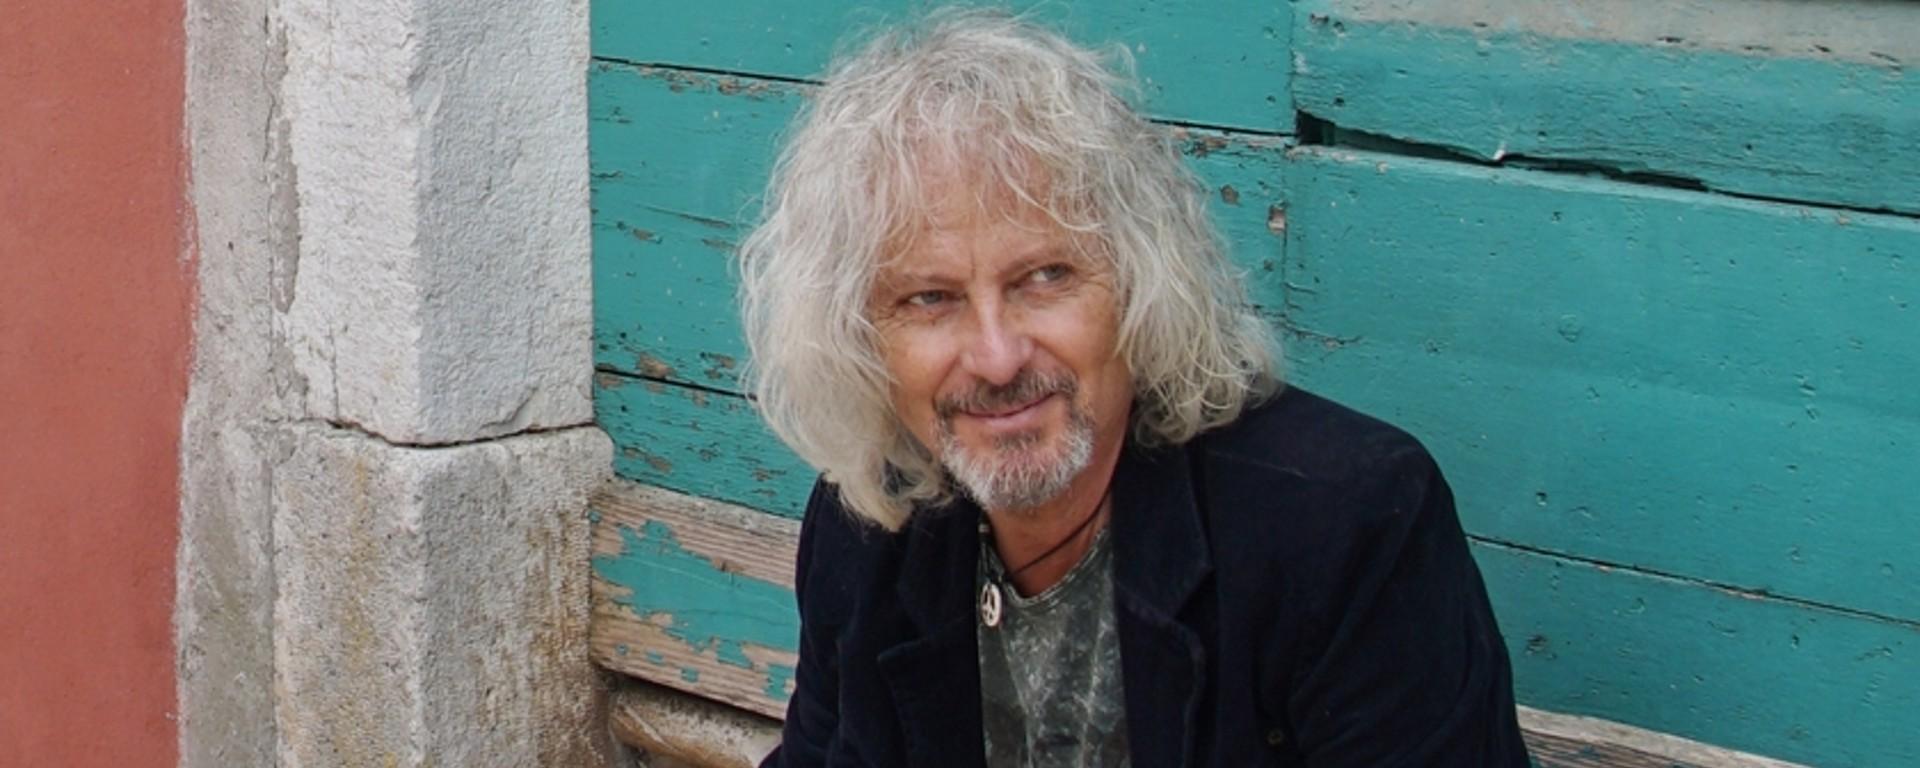 "Peter Nagy má nový klip ""Tam kde nie je signál"", ktorý nakrútili jeho skalní fanúšikovia!"